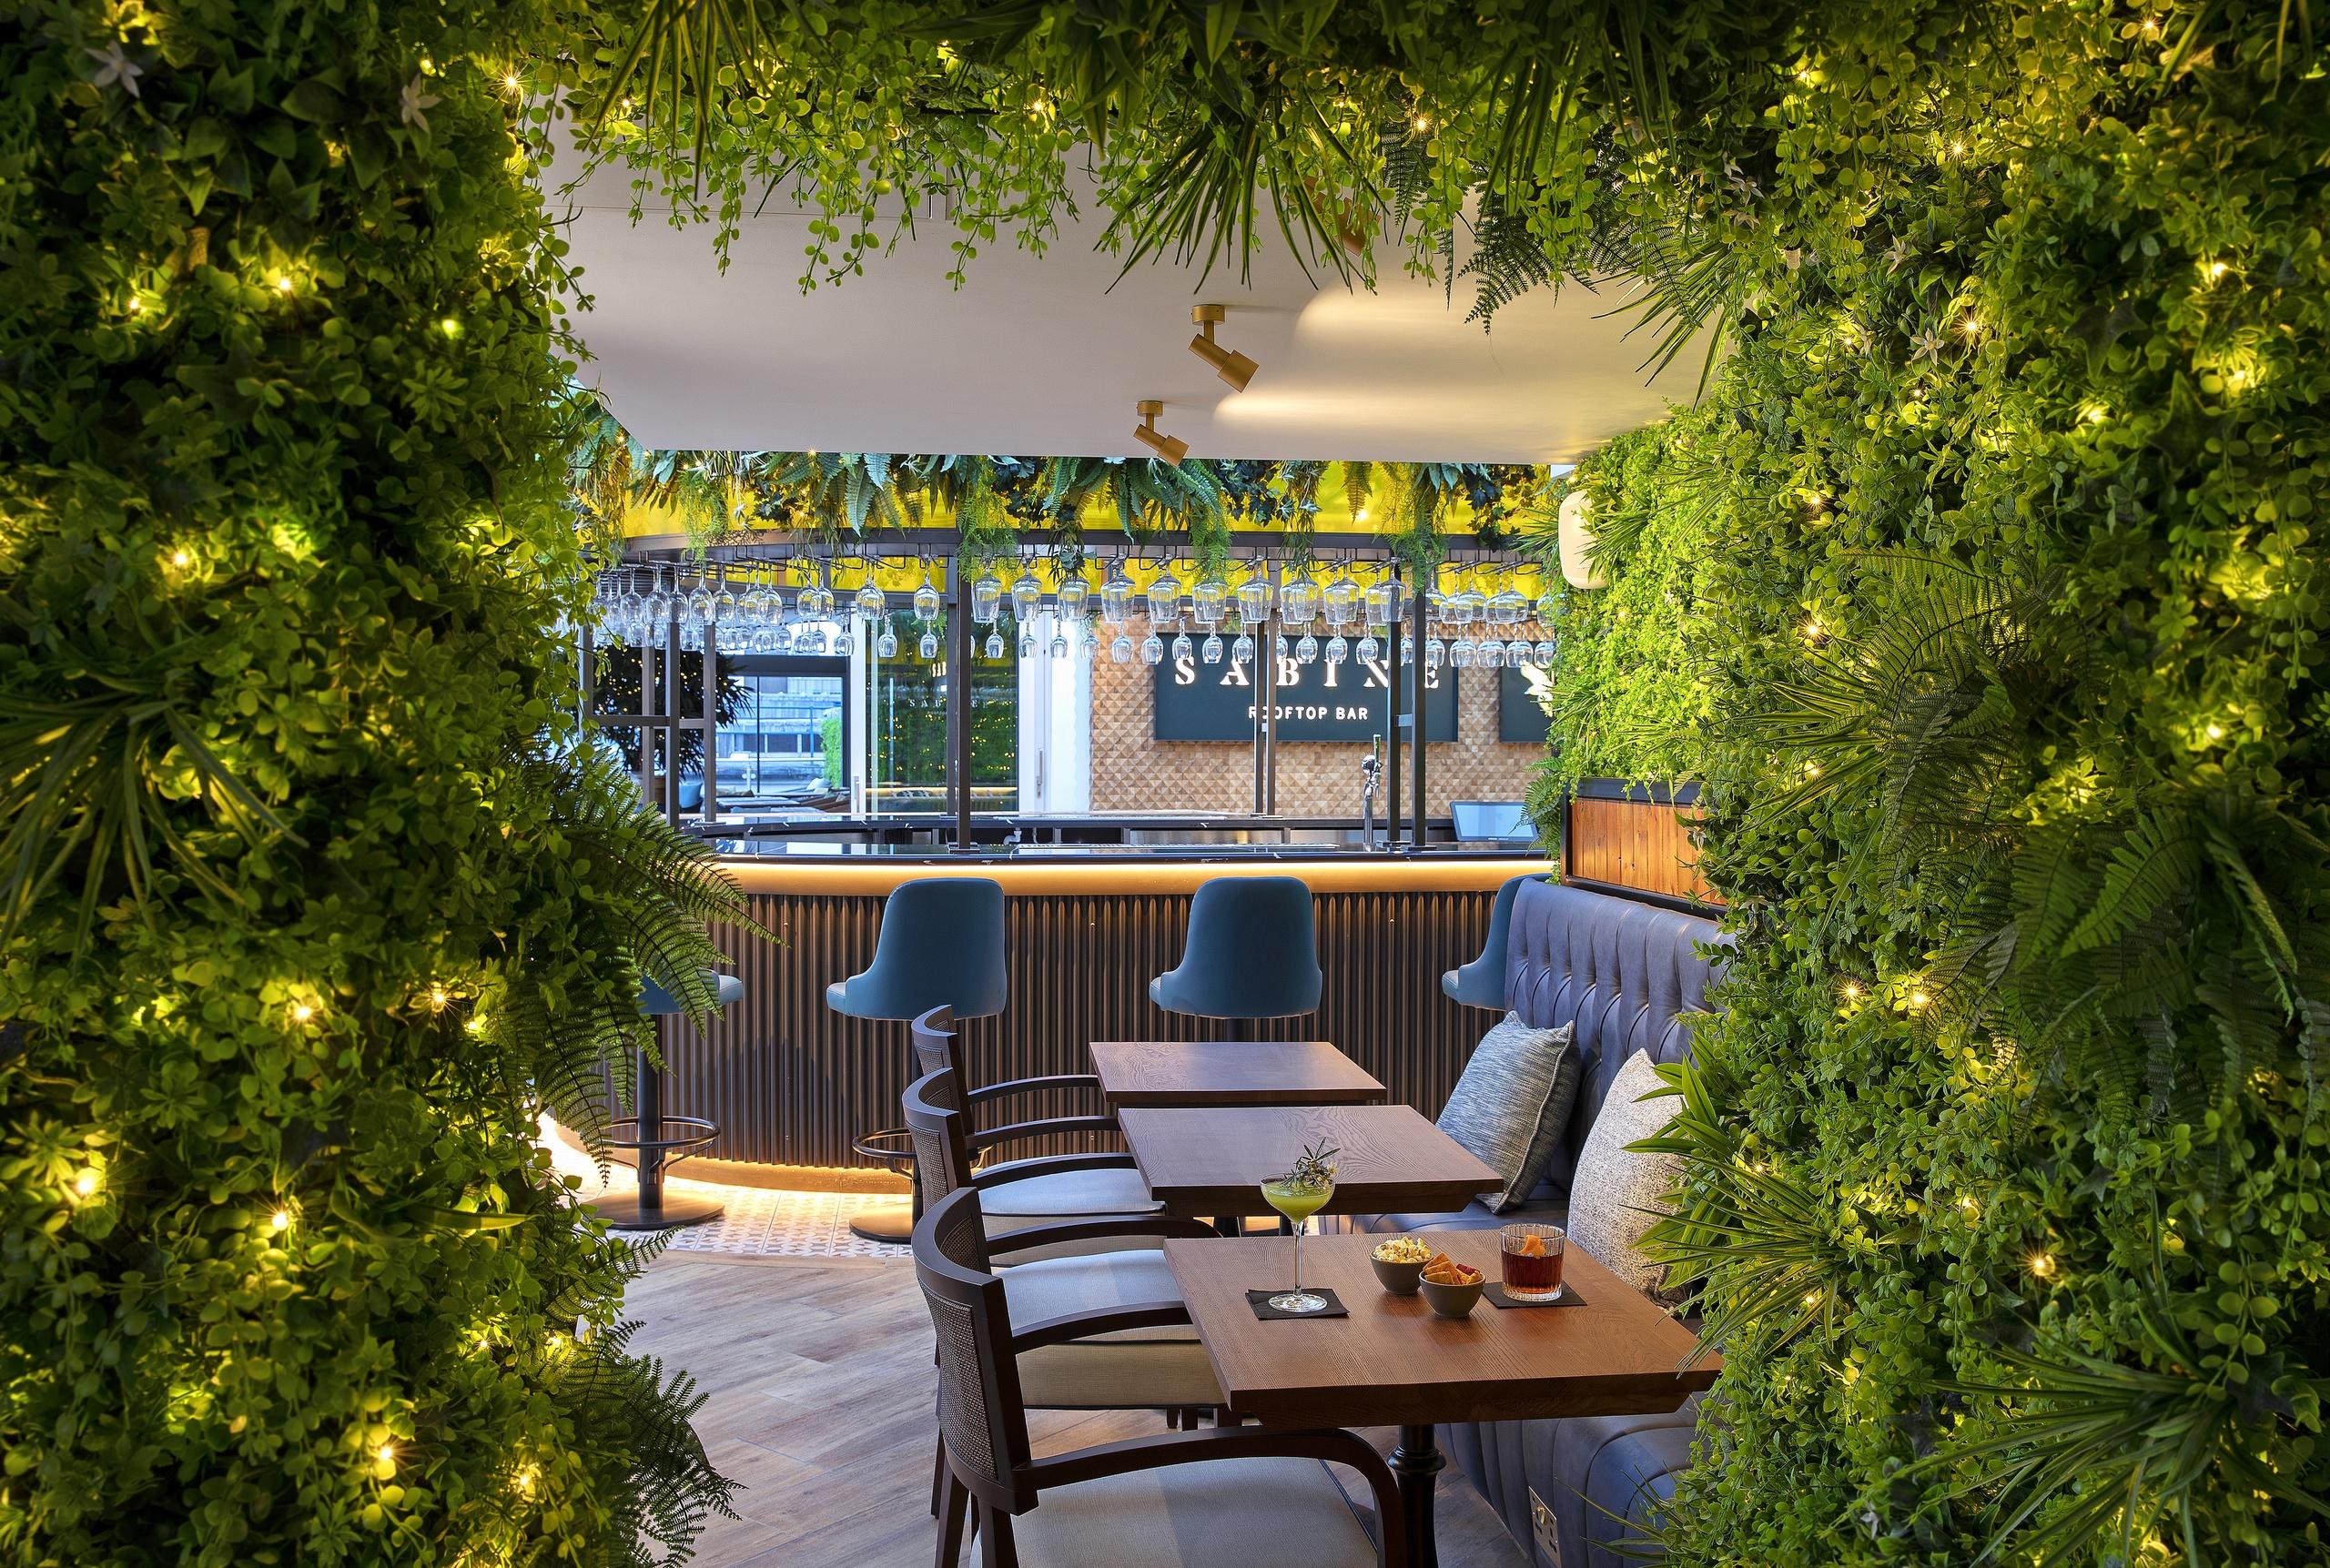 Sabine Rooftop Bar